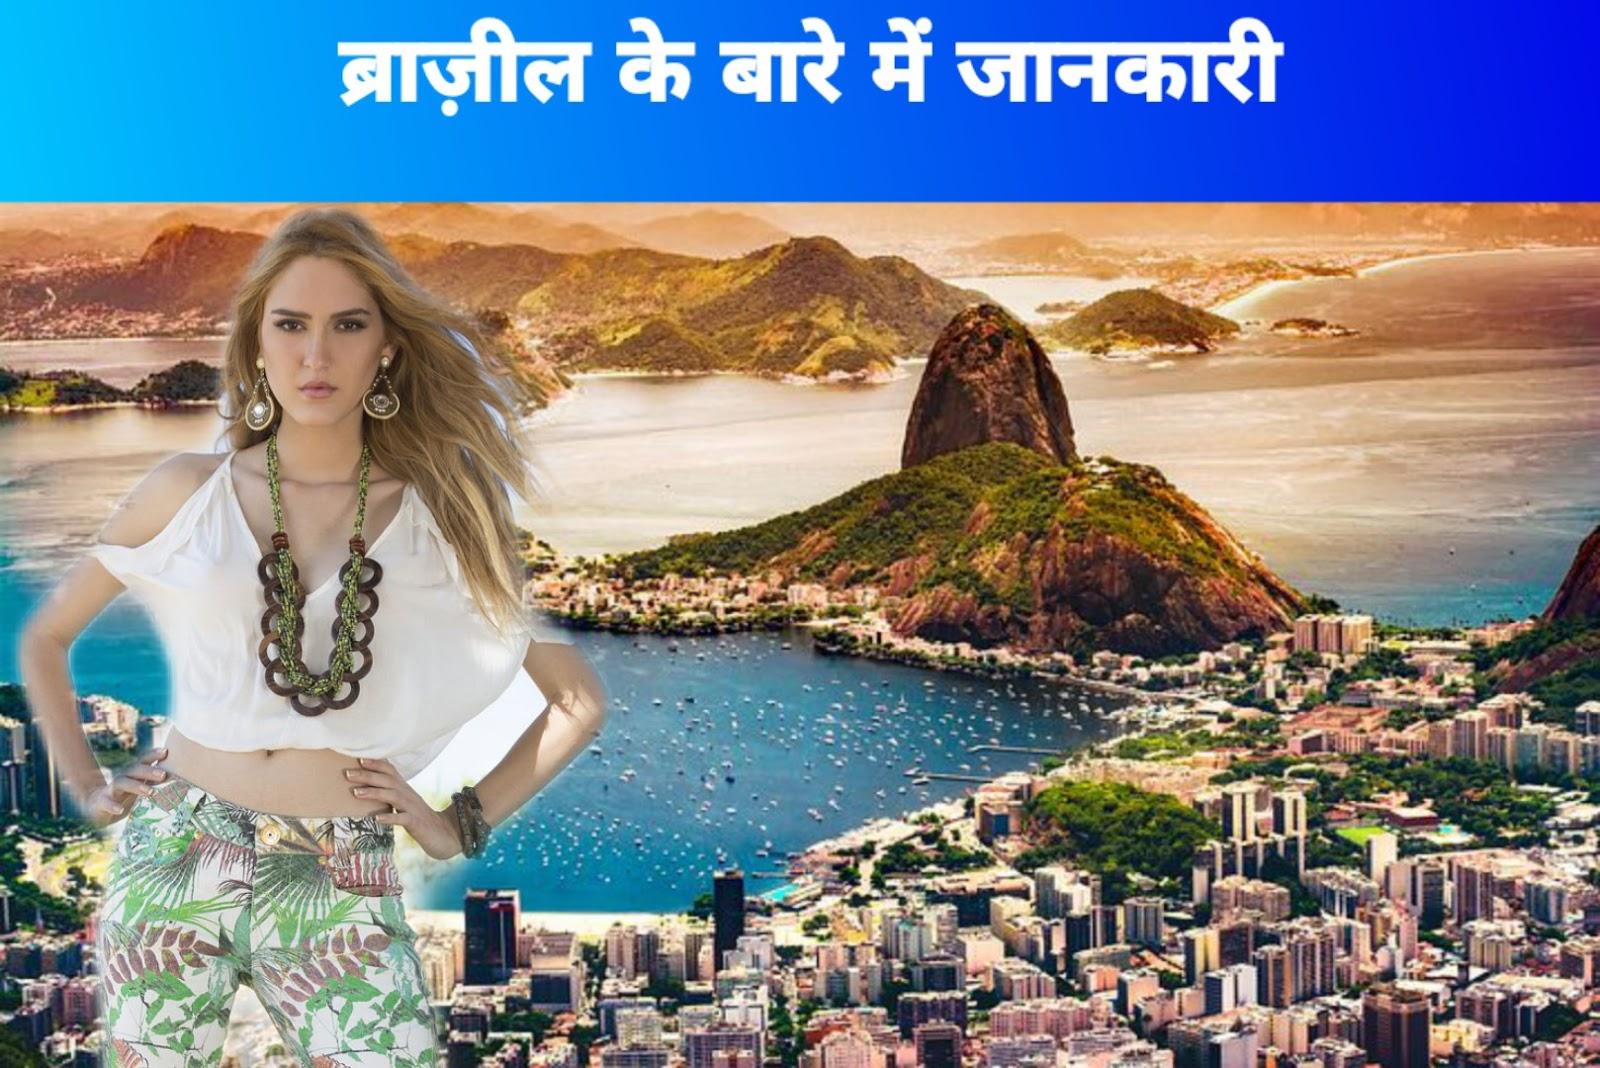 Amazing Facts about Brazil in Hindi - ब्राज़ील के बारे में रोचक तथ्य